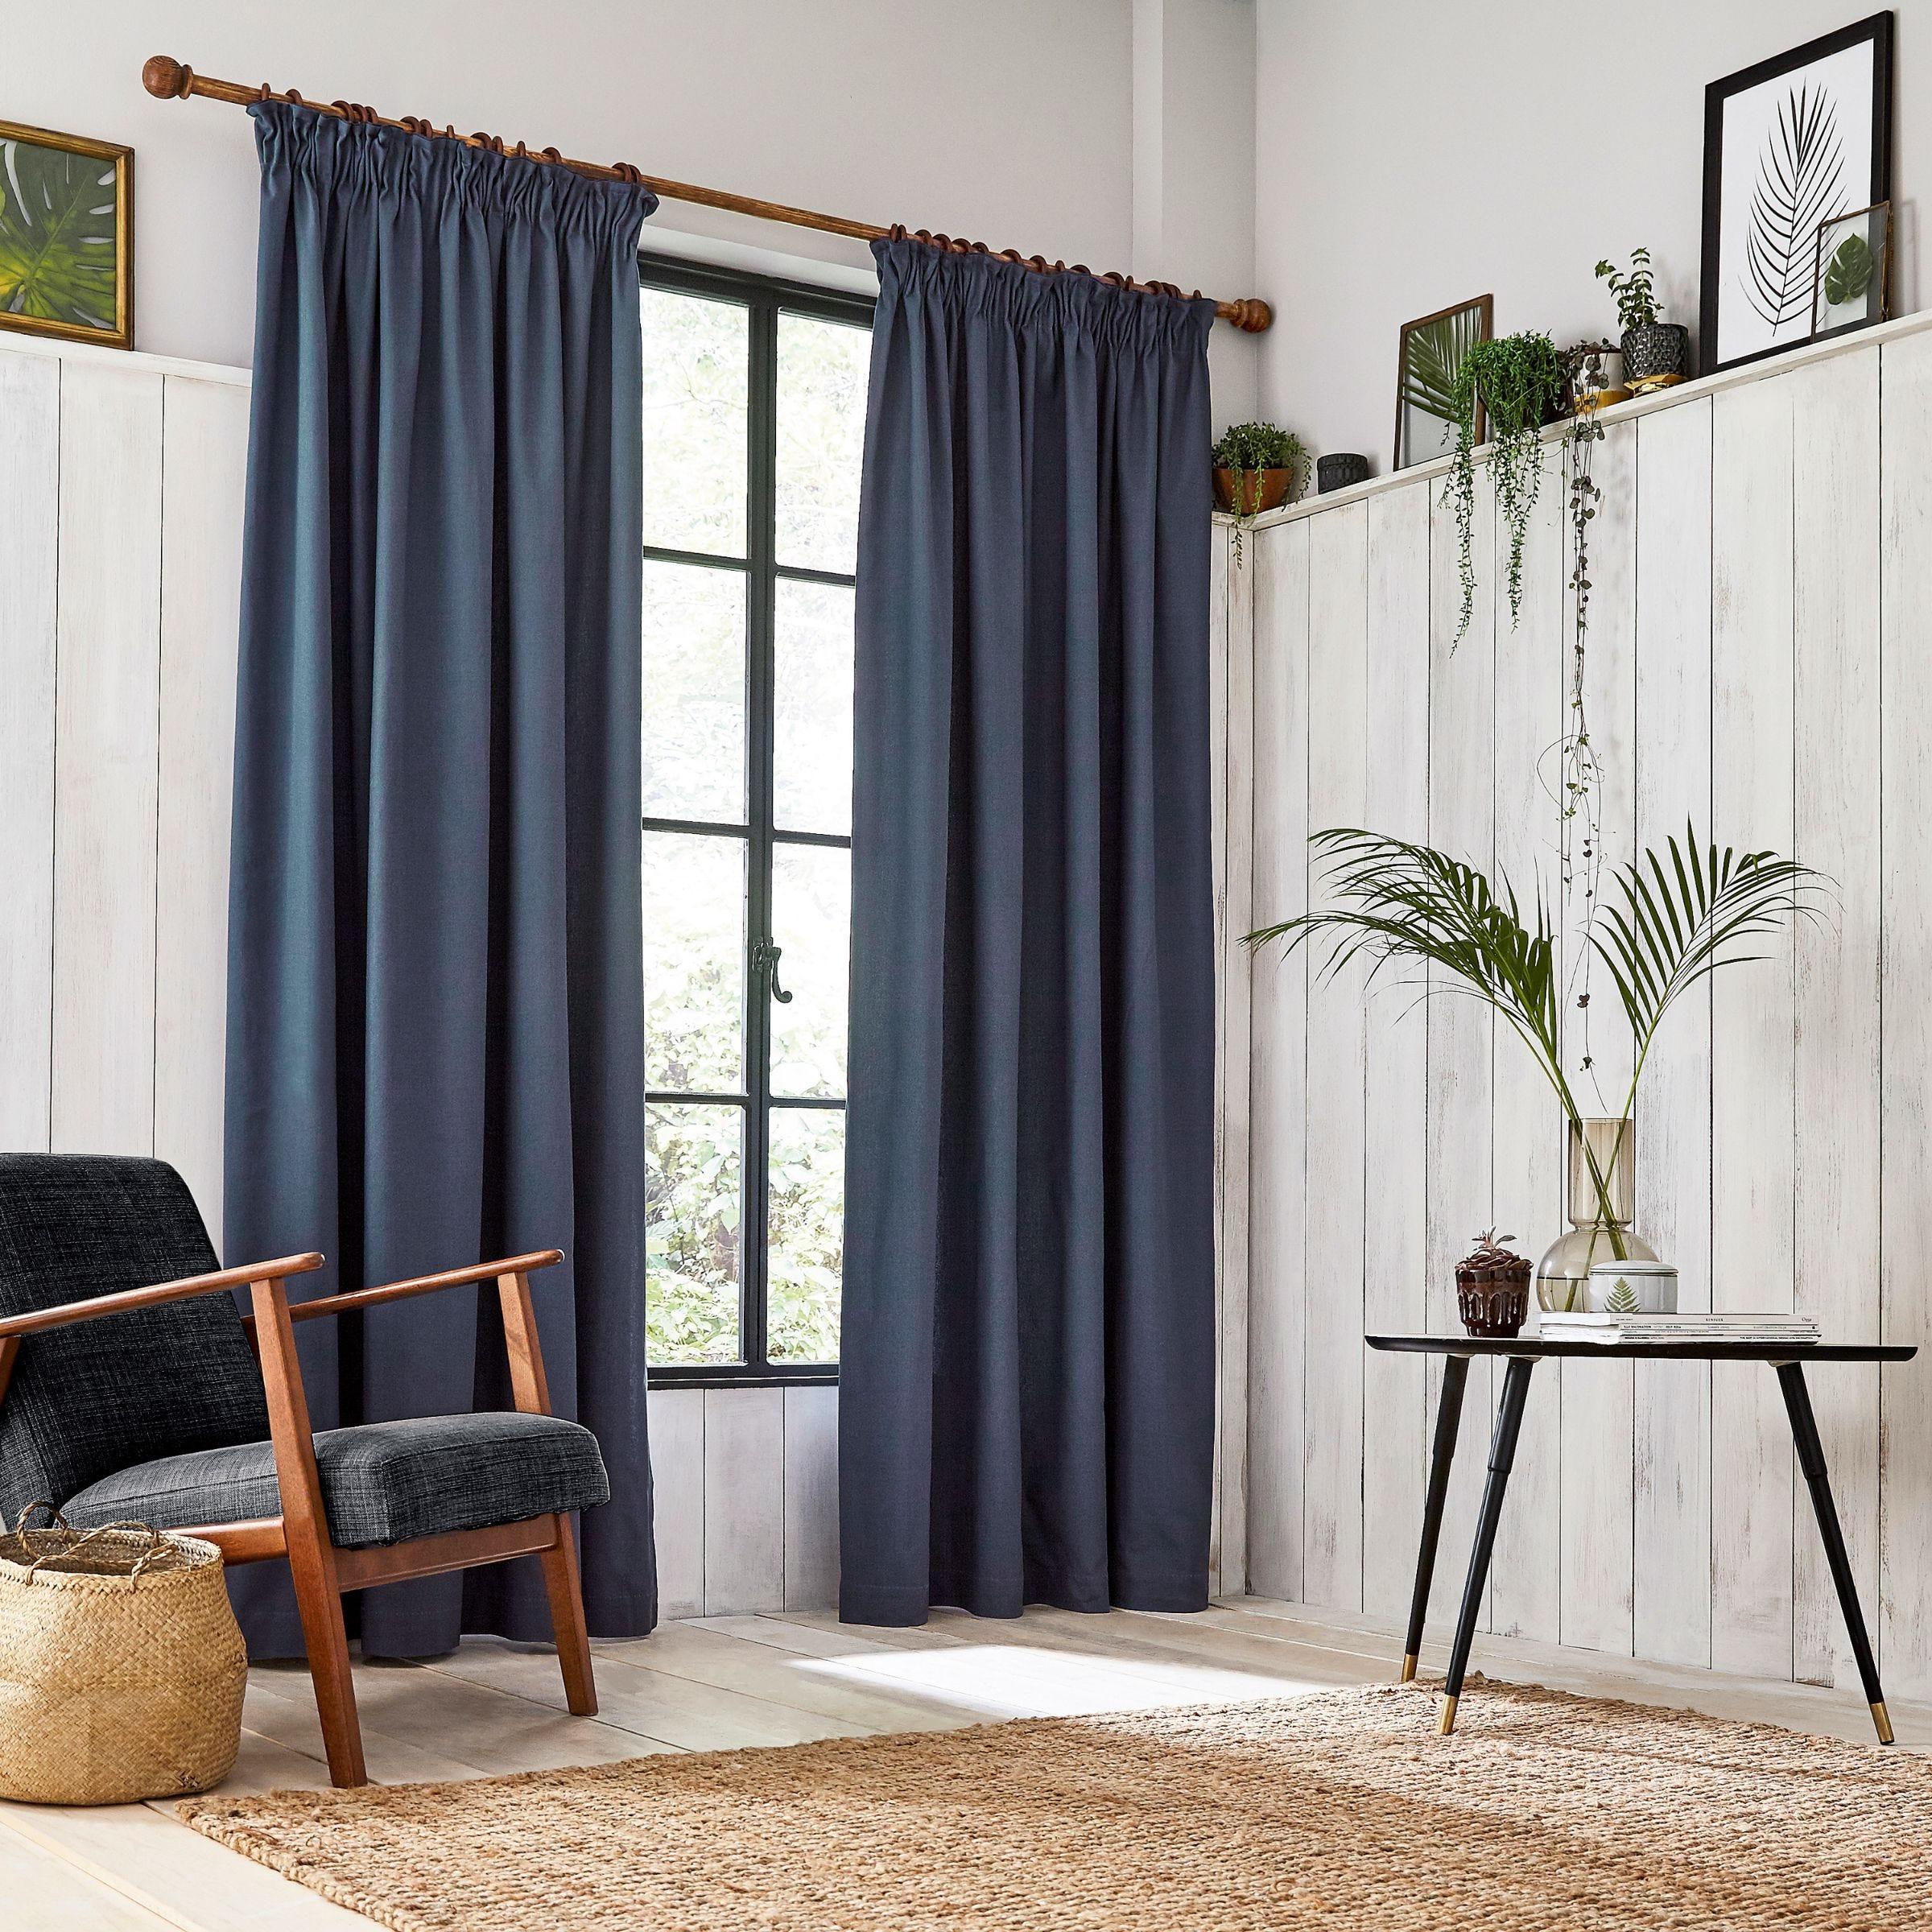 Clarissa Hulse Chroma Lined Curtains Dark Blue Bedeck Home